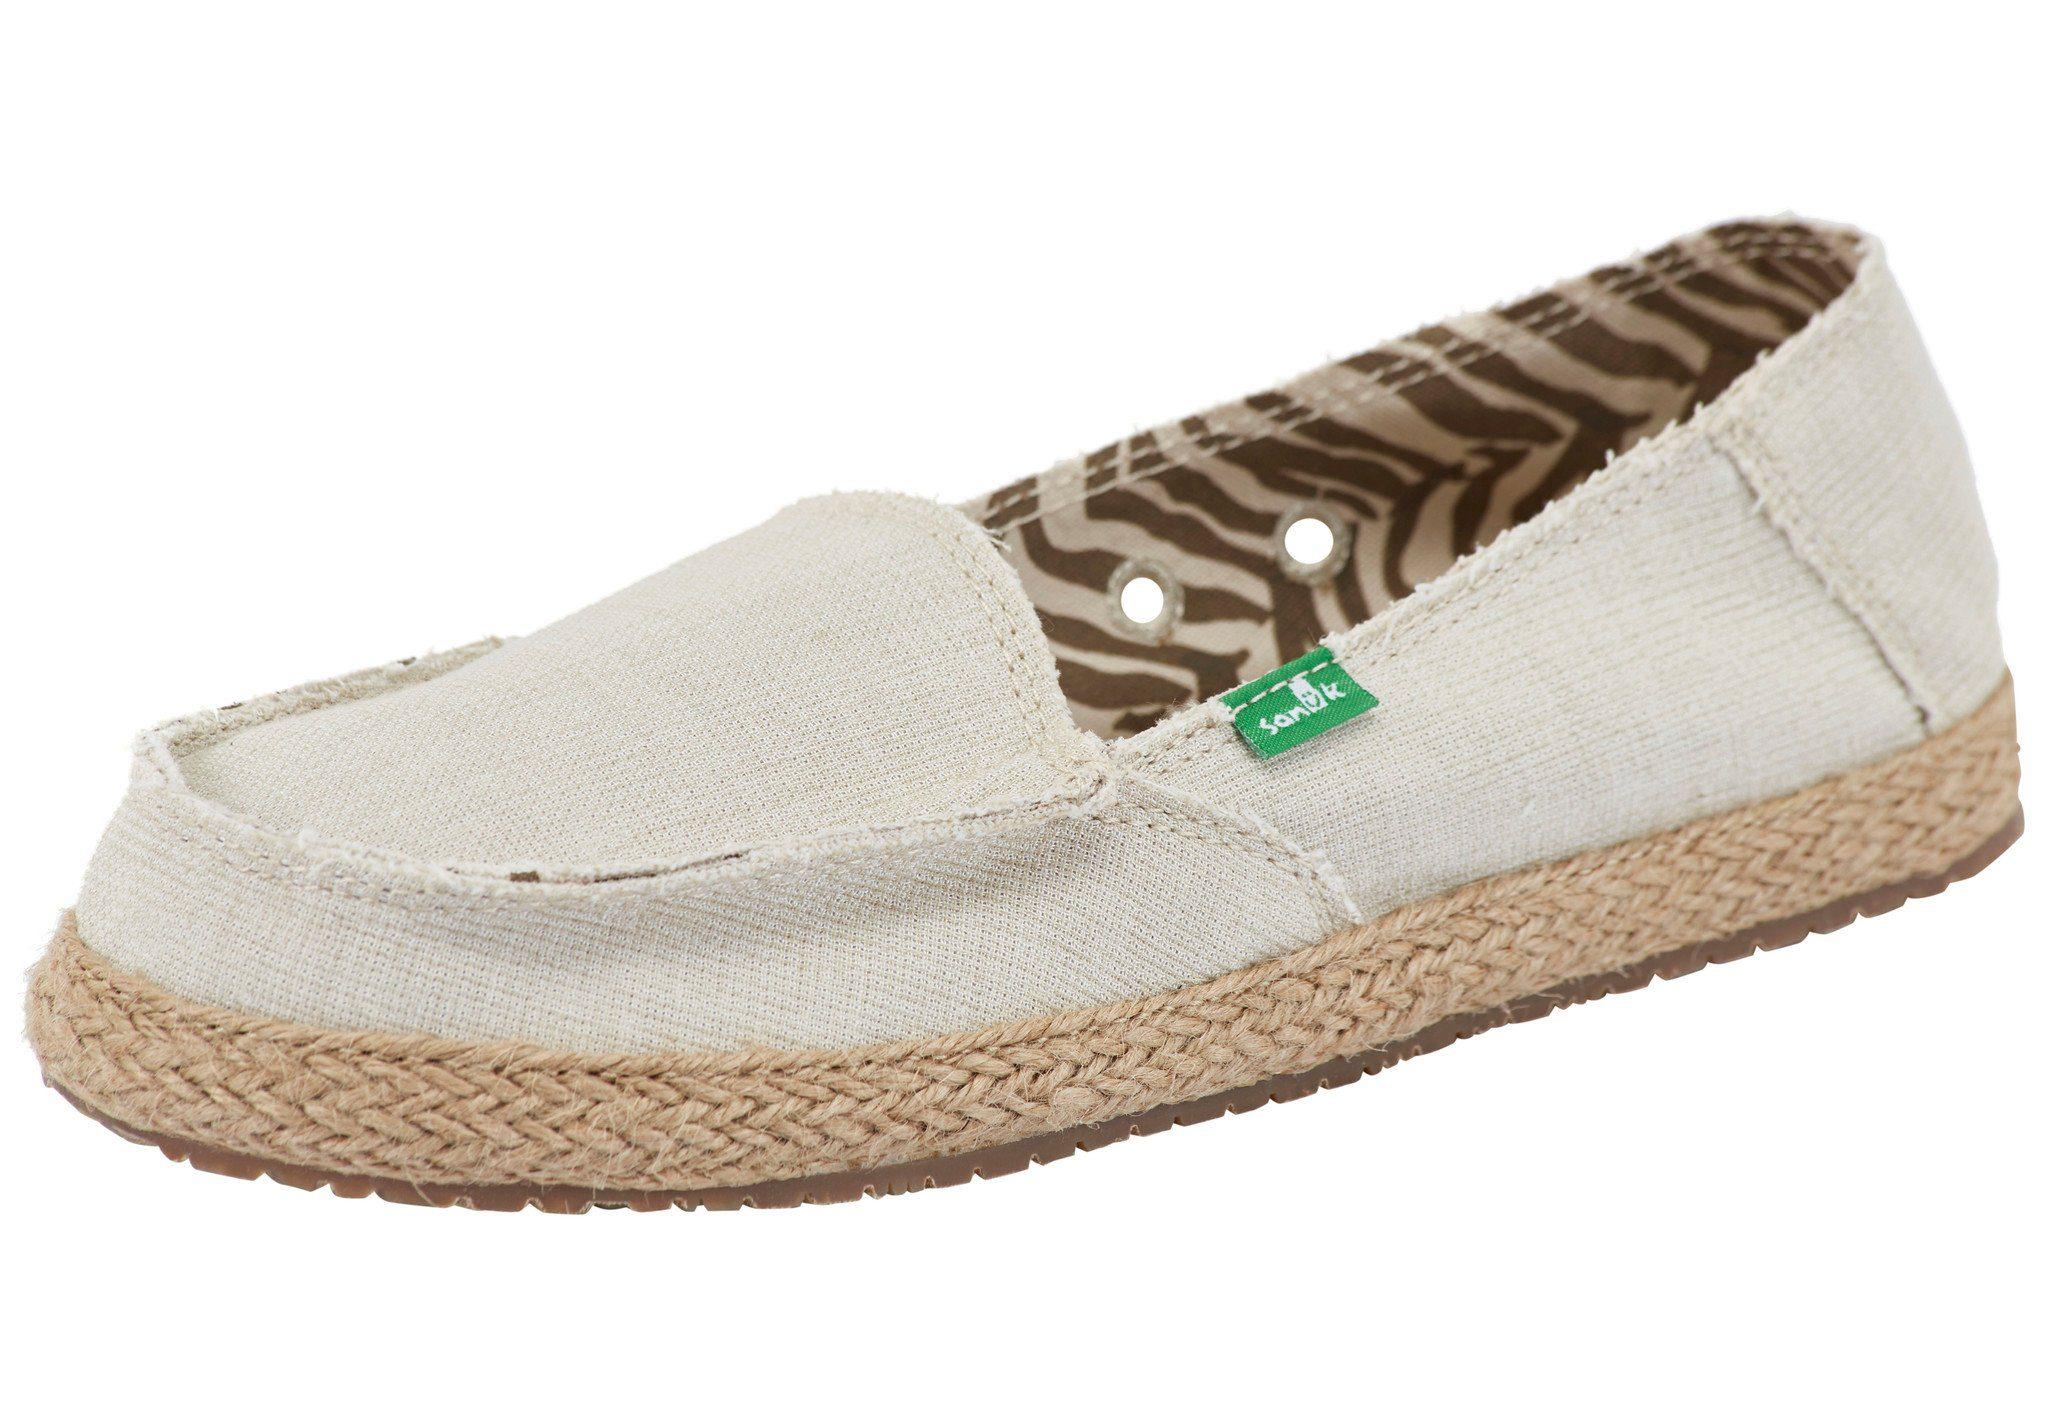 Sanük Kletterschuh »Sanük Fiona Shoes Women«